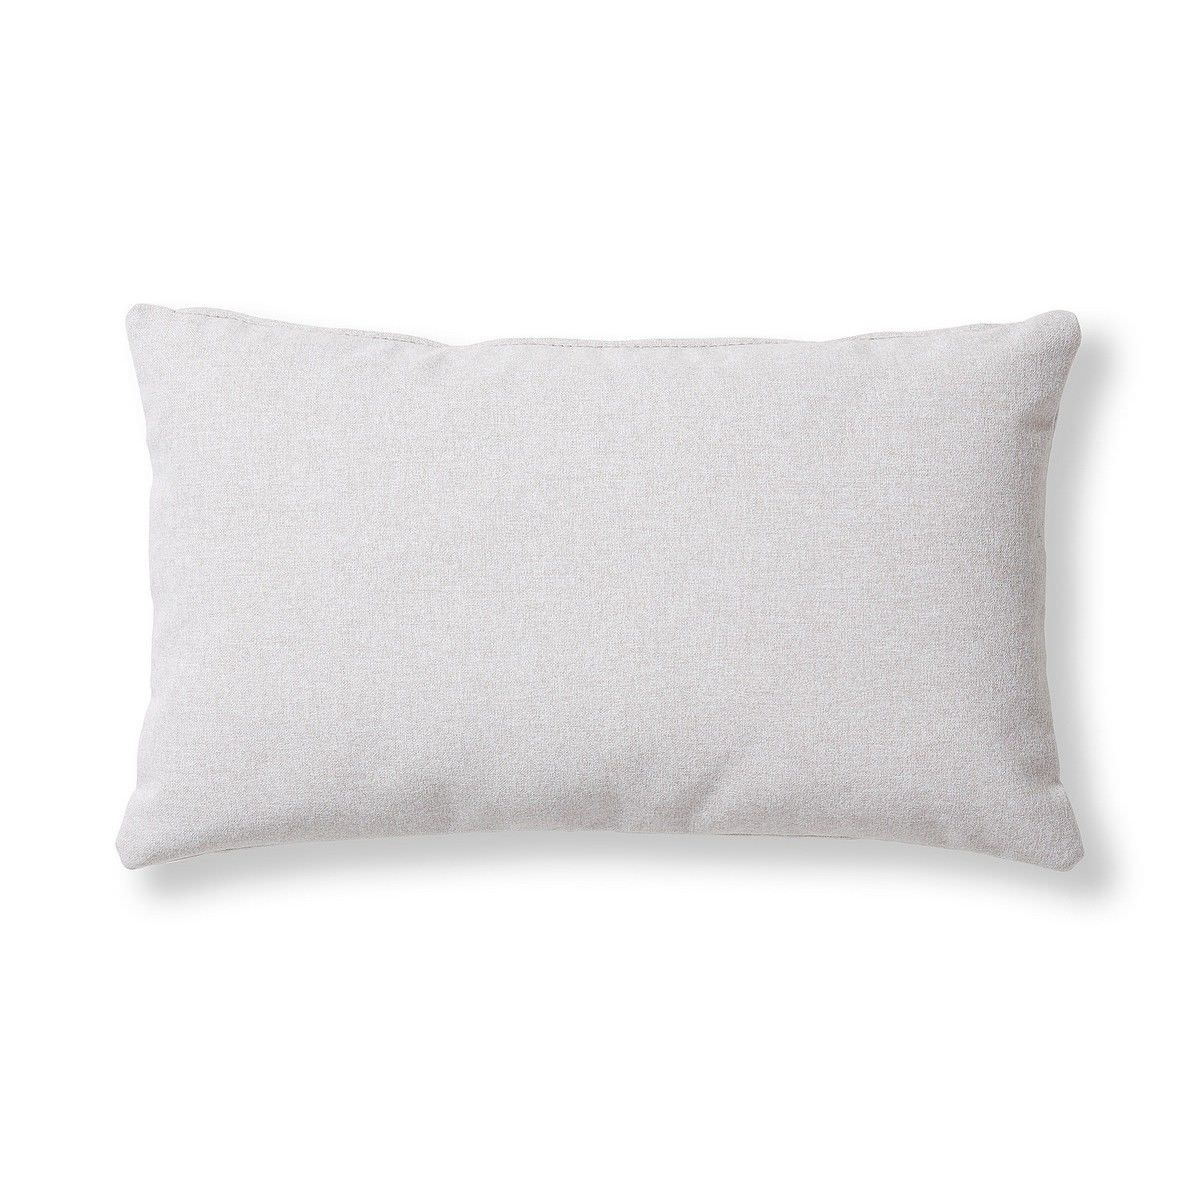 Franco Fabric Lumbar Cushion, Beige